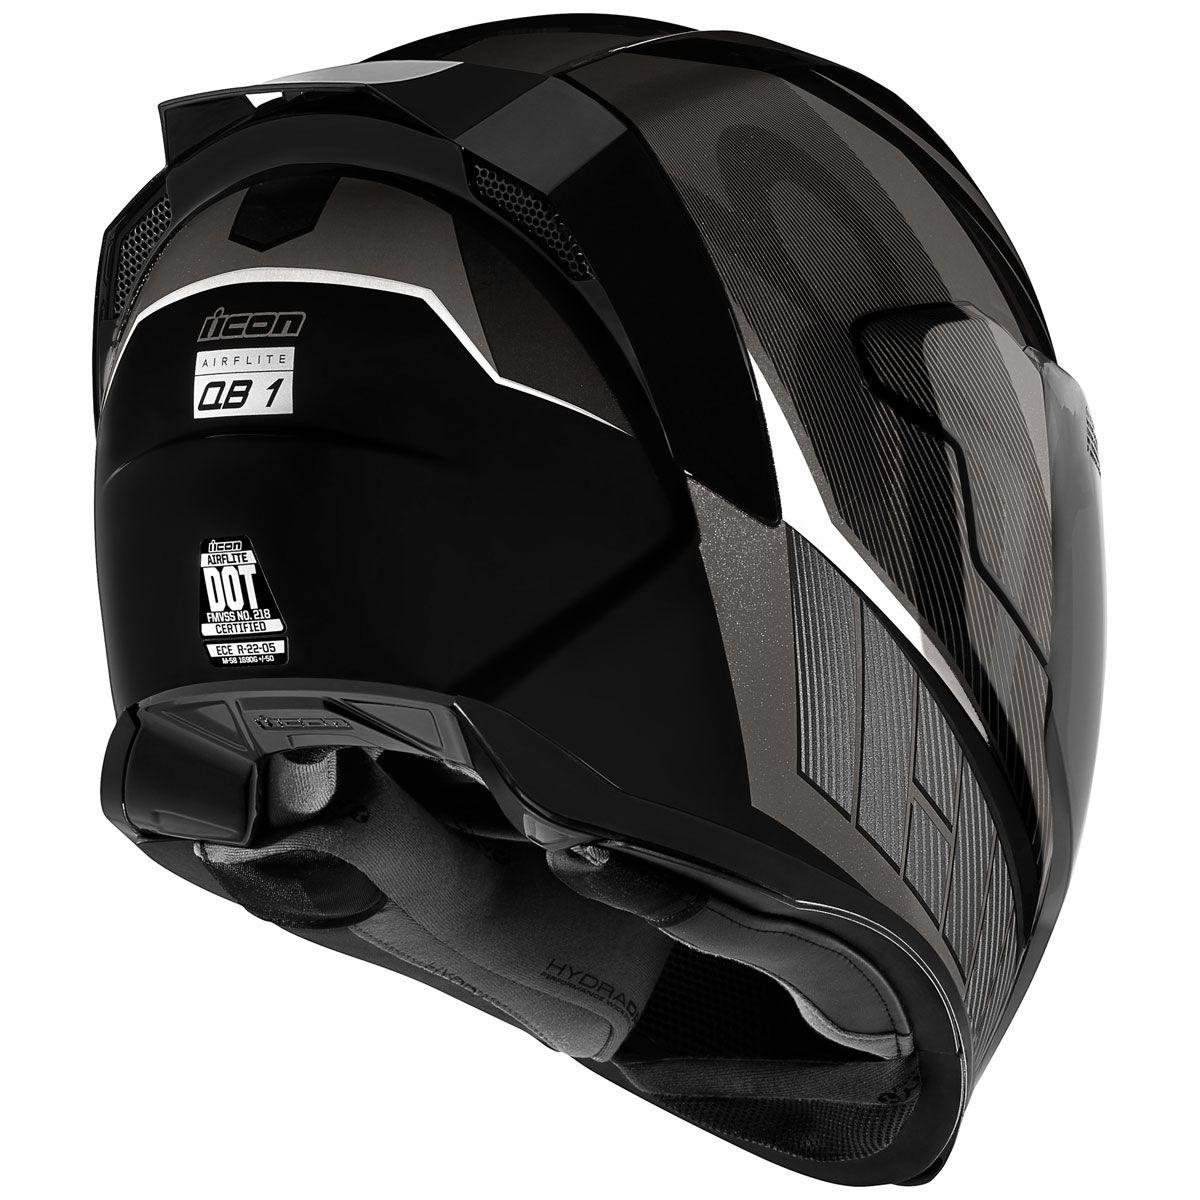 ICON Airflite QB1 Black Full Face Helmet 010112063 in